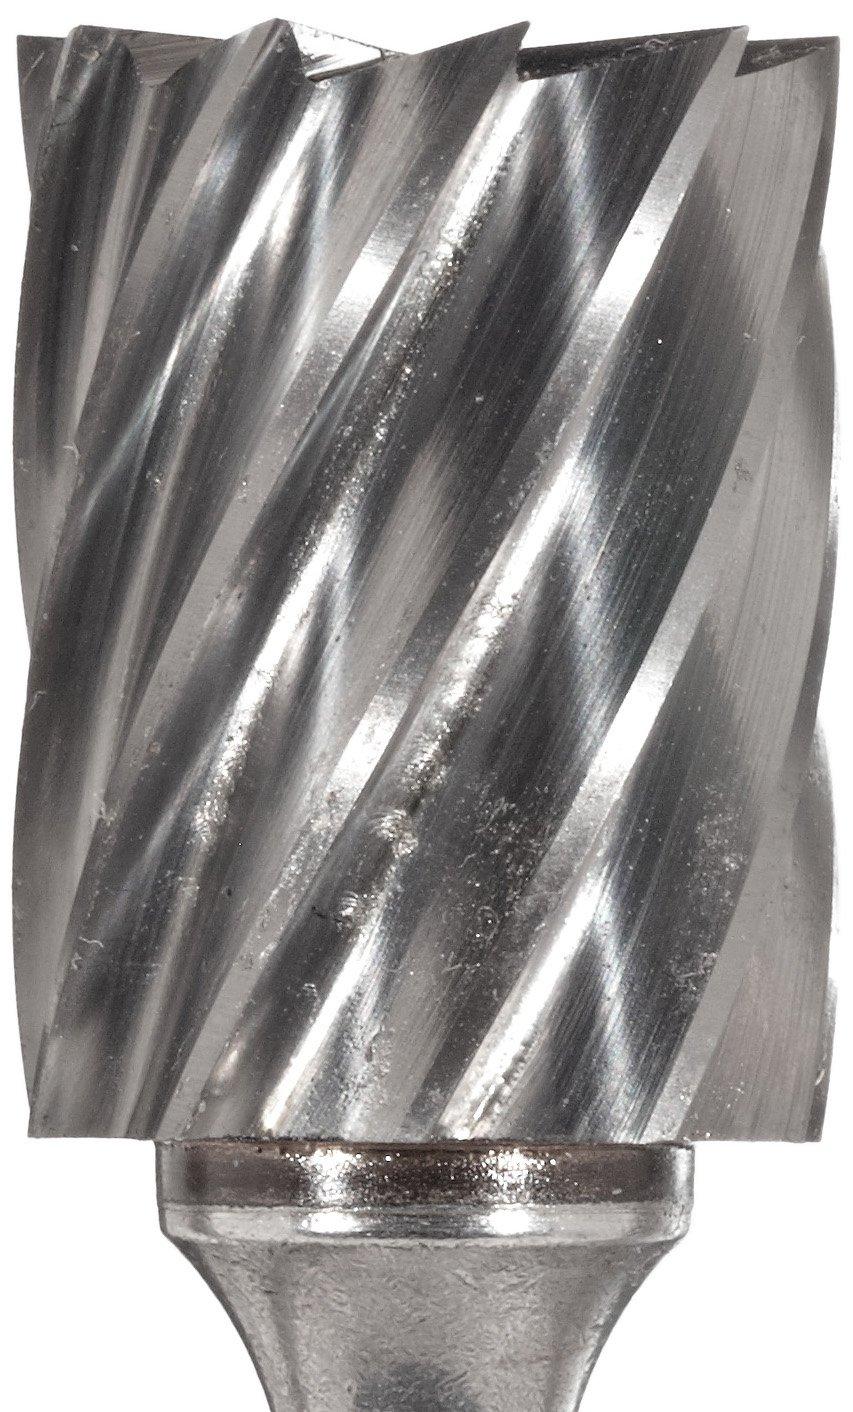 1//8 Shank Uncoated Bright Bassett SB-42 Cylindrical Solid Carbide Bur Finish Single Cut 7//16 Head Length 3//32 Head Diameter End Cut End